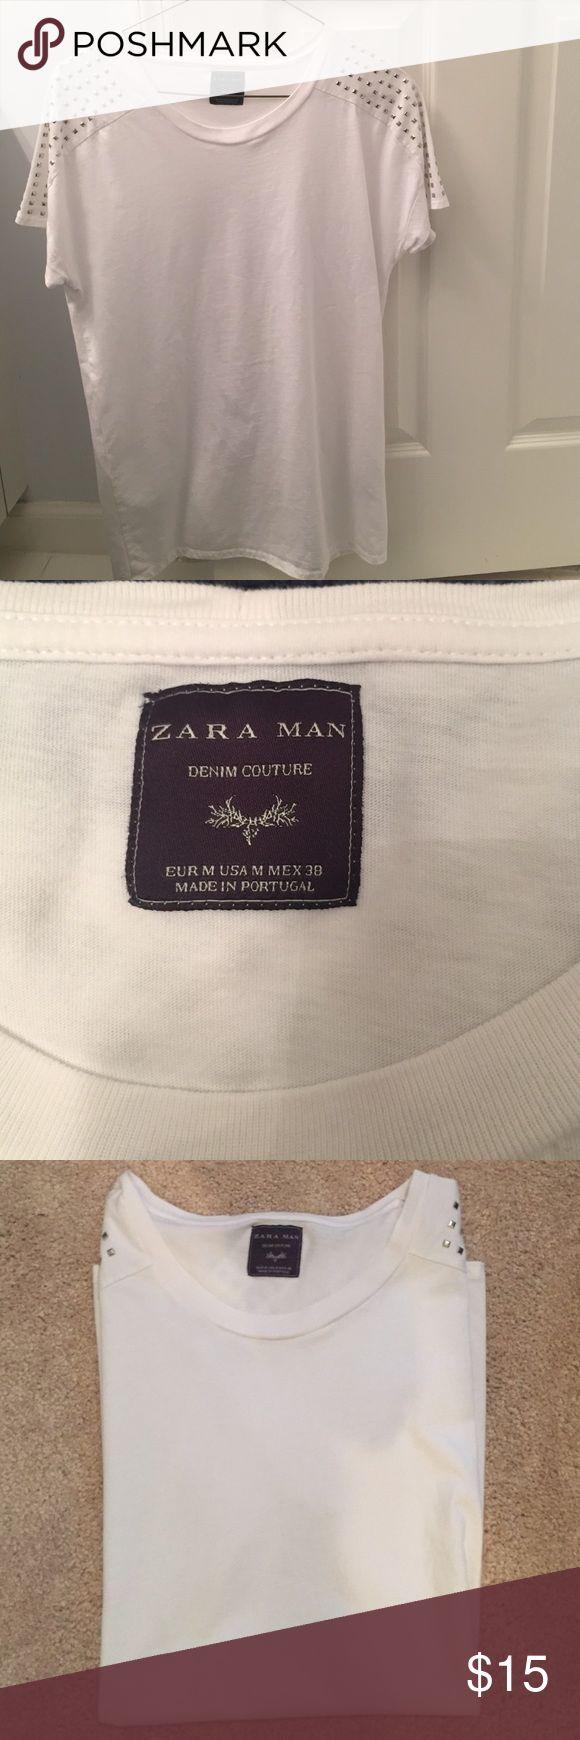 Zara Men's Studded Shirt BARELY WORN (only worn once) Zara Men's studded shirt. The shoulders are studded. Zara Shirts Tees - Short Sleeve